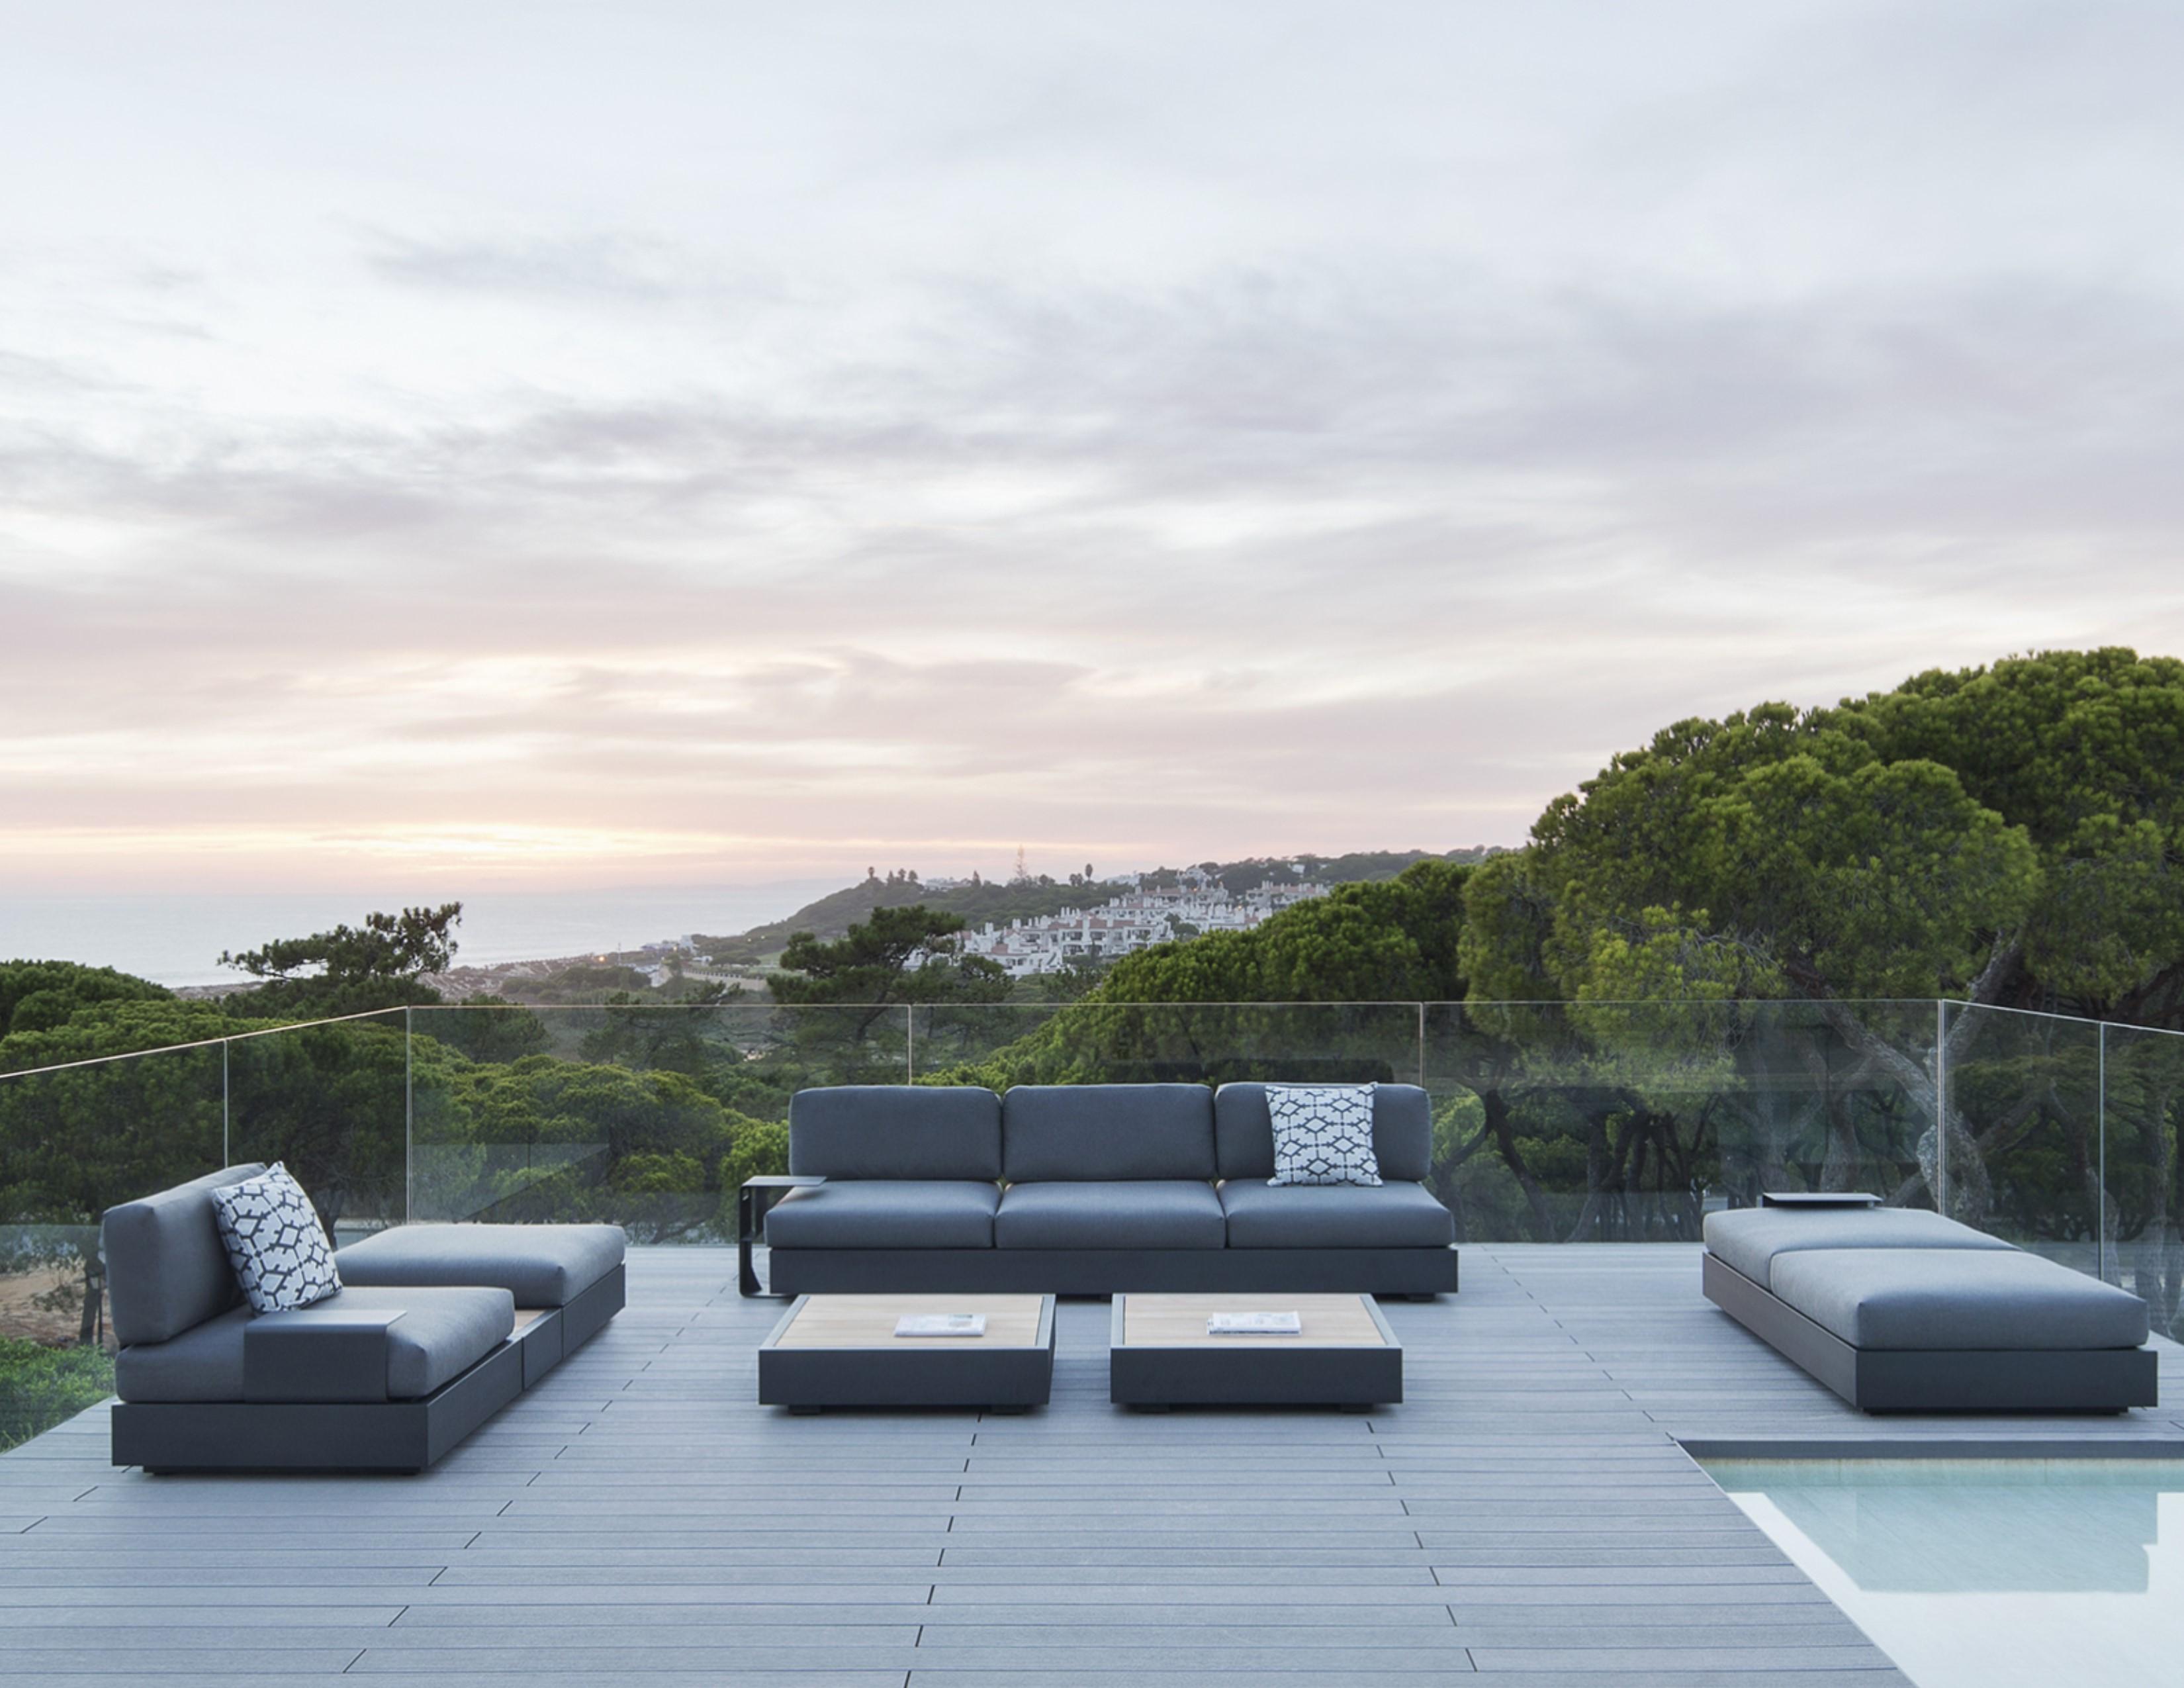 ari white black modern luxury sectional modular elements adjust back multi function outdoor oasis landscape design hotel contract pool furniture